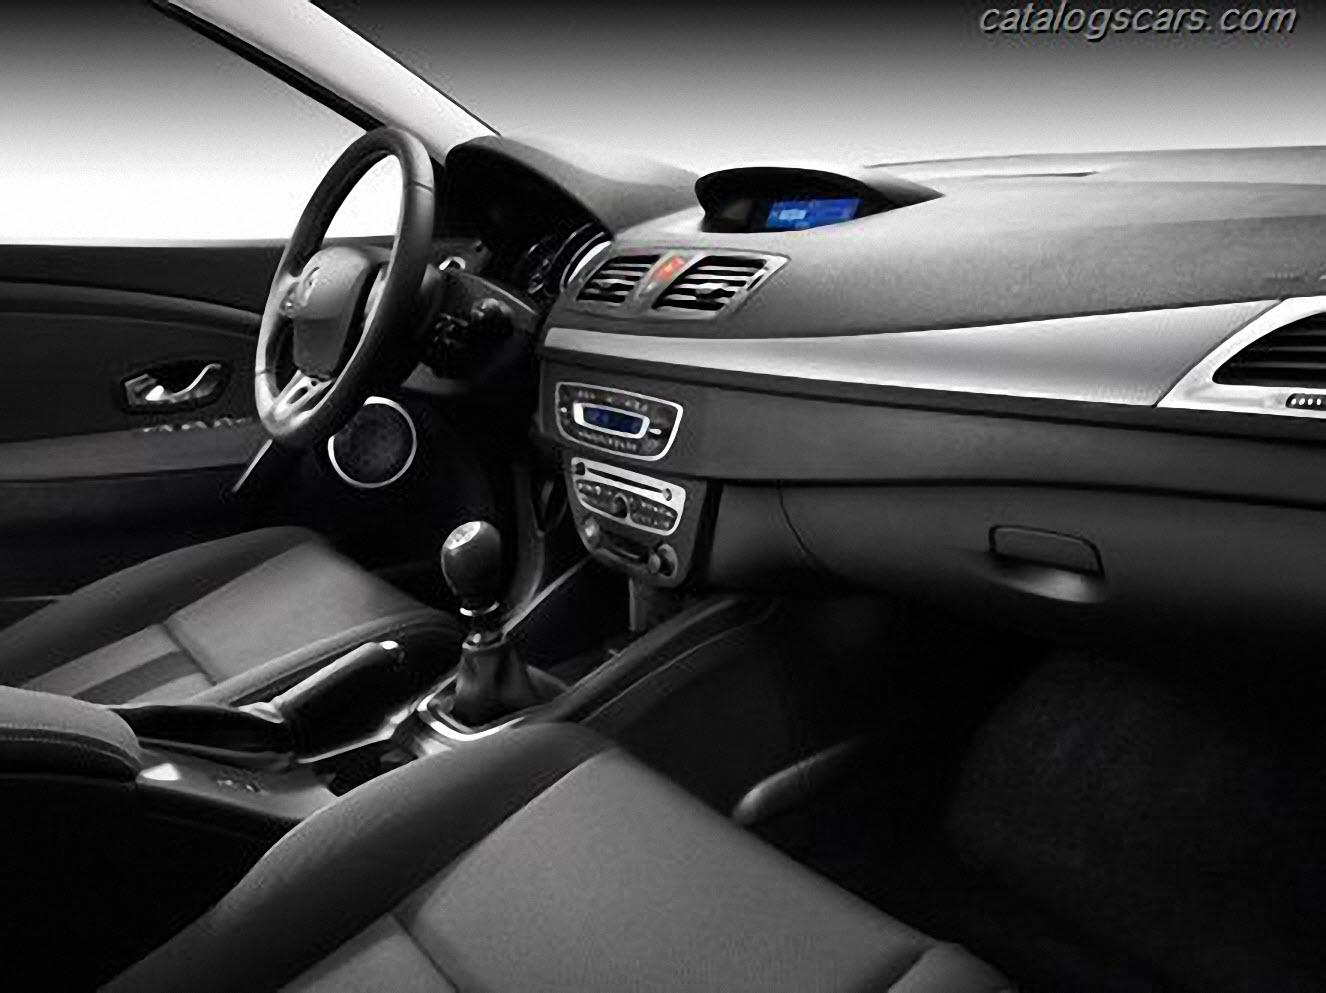 صور سيارة رينو ميجان هاتش باك 2015 - اجمل خلفيات صور عربية رينو ميجان هاتش باك 2015 - Renault Megane Hatchback Photos Renault-Megane_Hatchback_2012_800x600_wallpaper_14.jpg